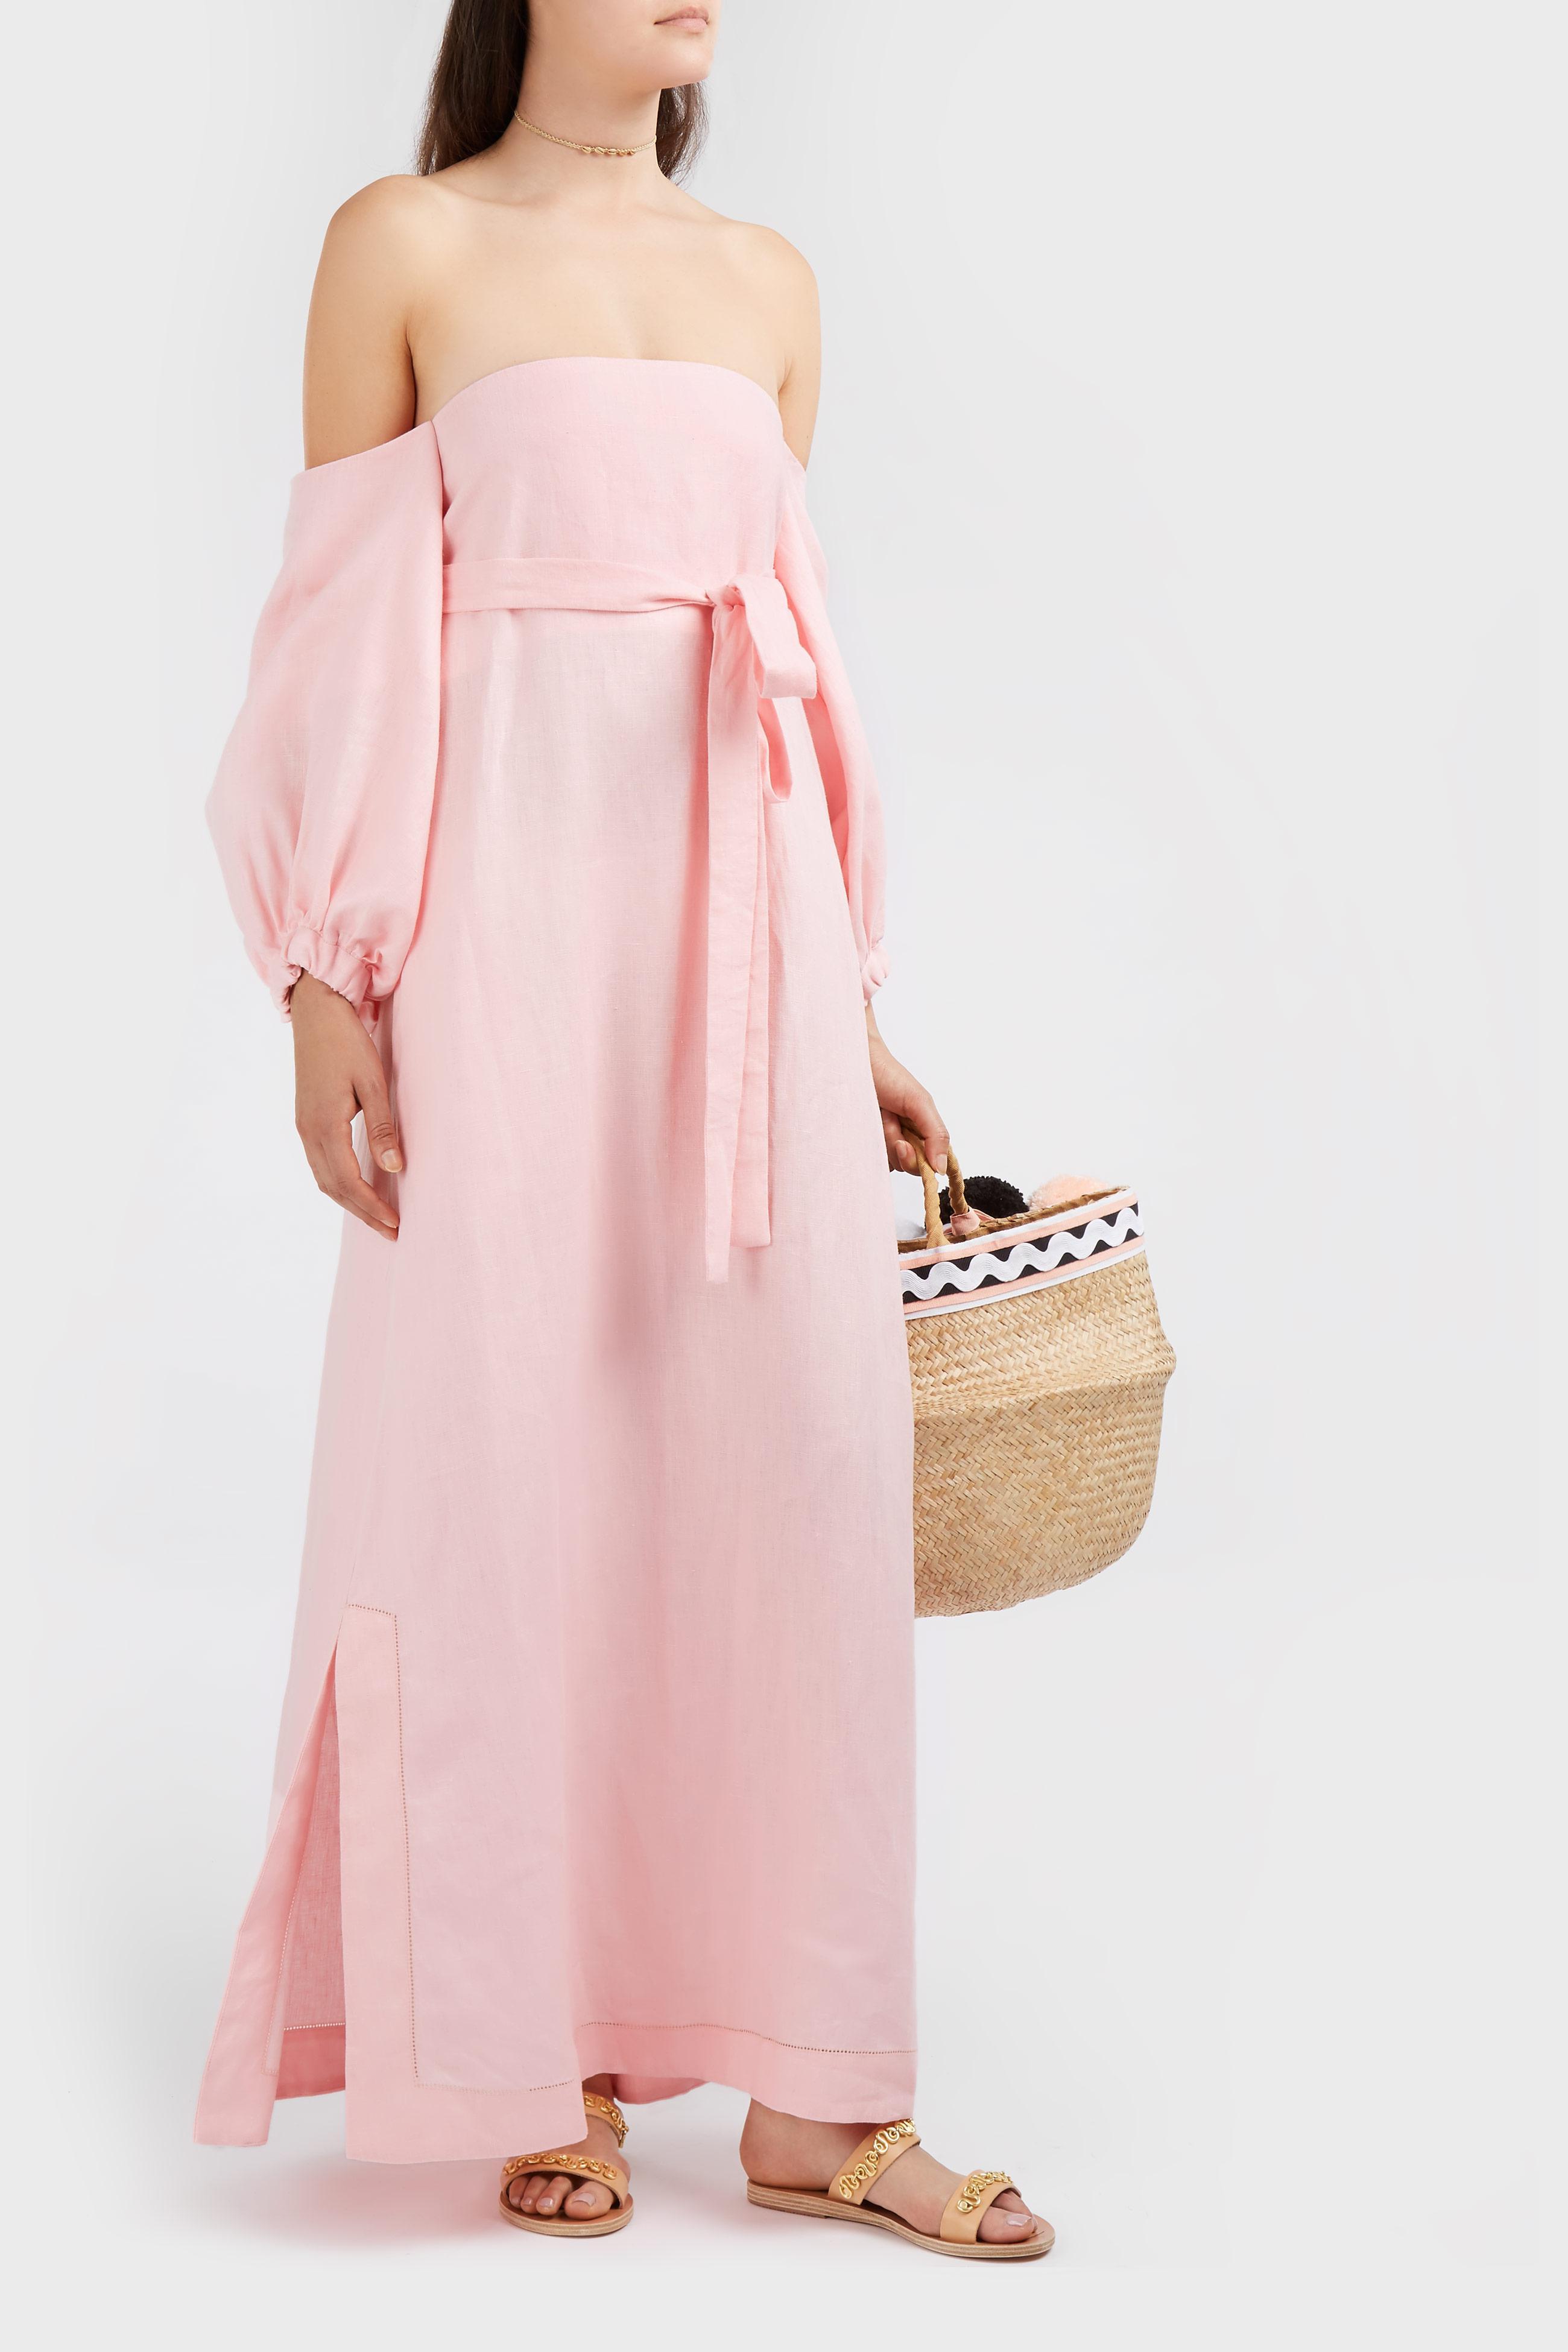 454286f2f6 Lisa Marie Fernandez Rosie Off-the-shoulder Linen Maxi Dress in Pink ...